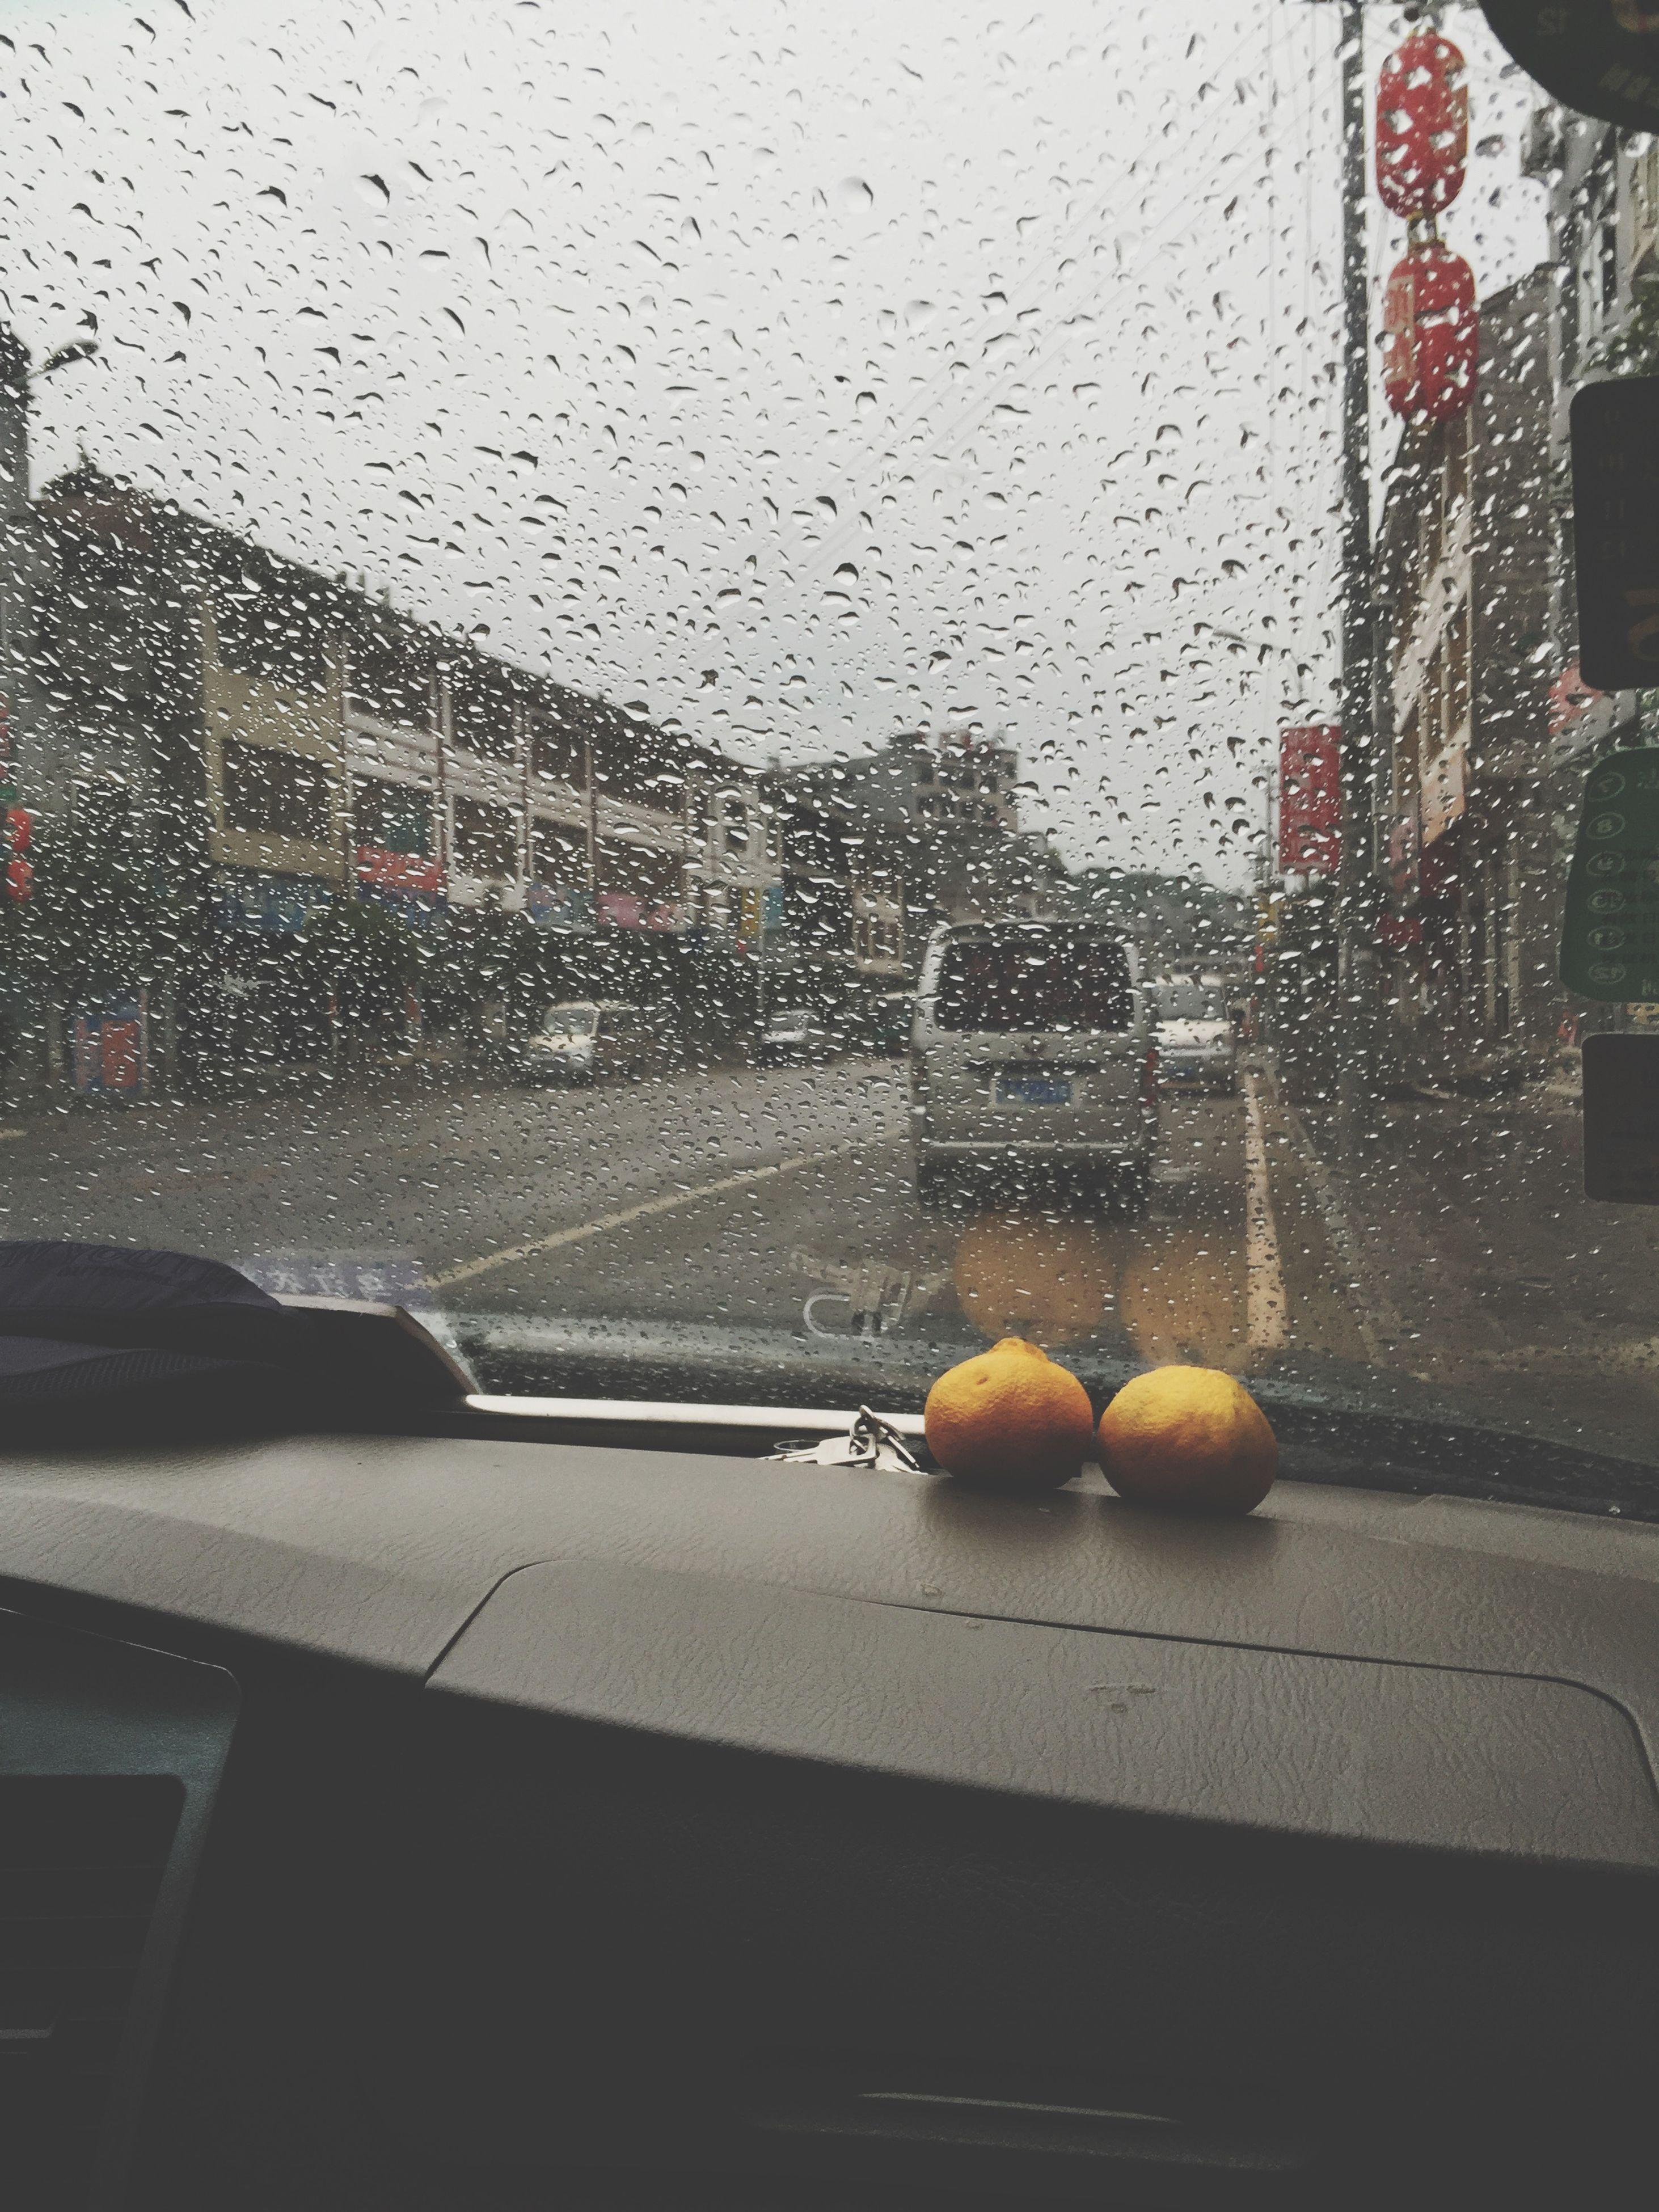 window, transparent, glass - material, wet, drop, indoors, rain, water, car, architecture, building exterior, built structure, glass, raindrop, season, weather, city, sky, transportation, land vehicle